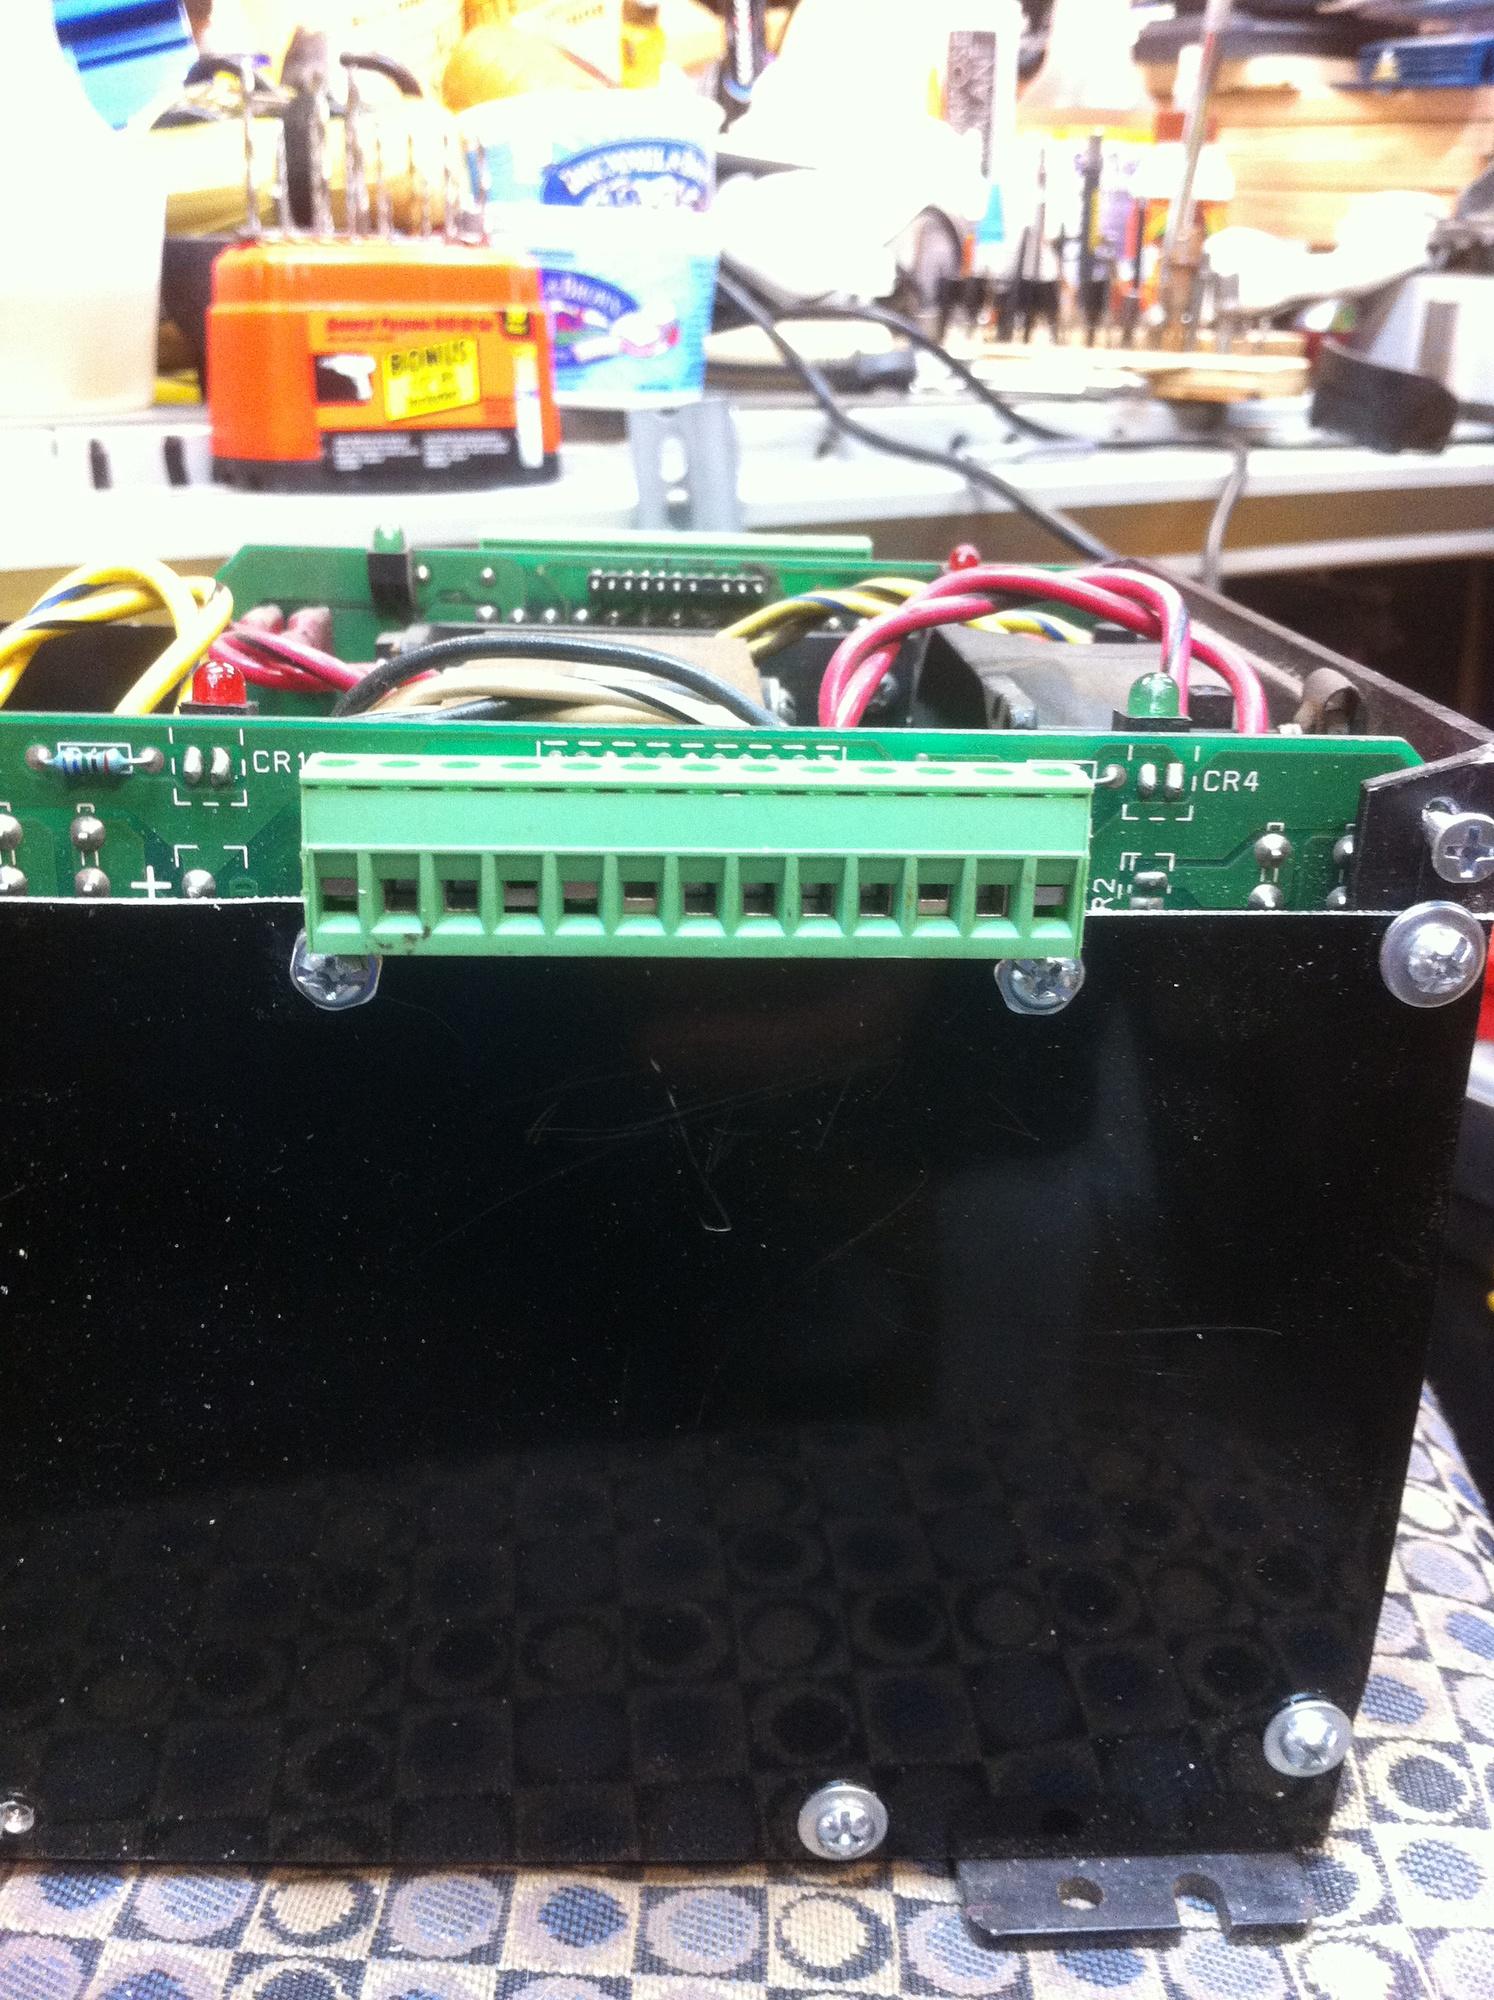 Anaheim Automation DPF72003 help - Router Forums